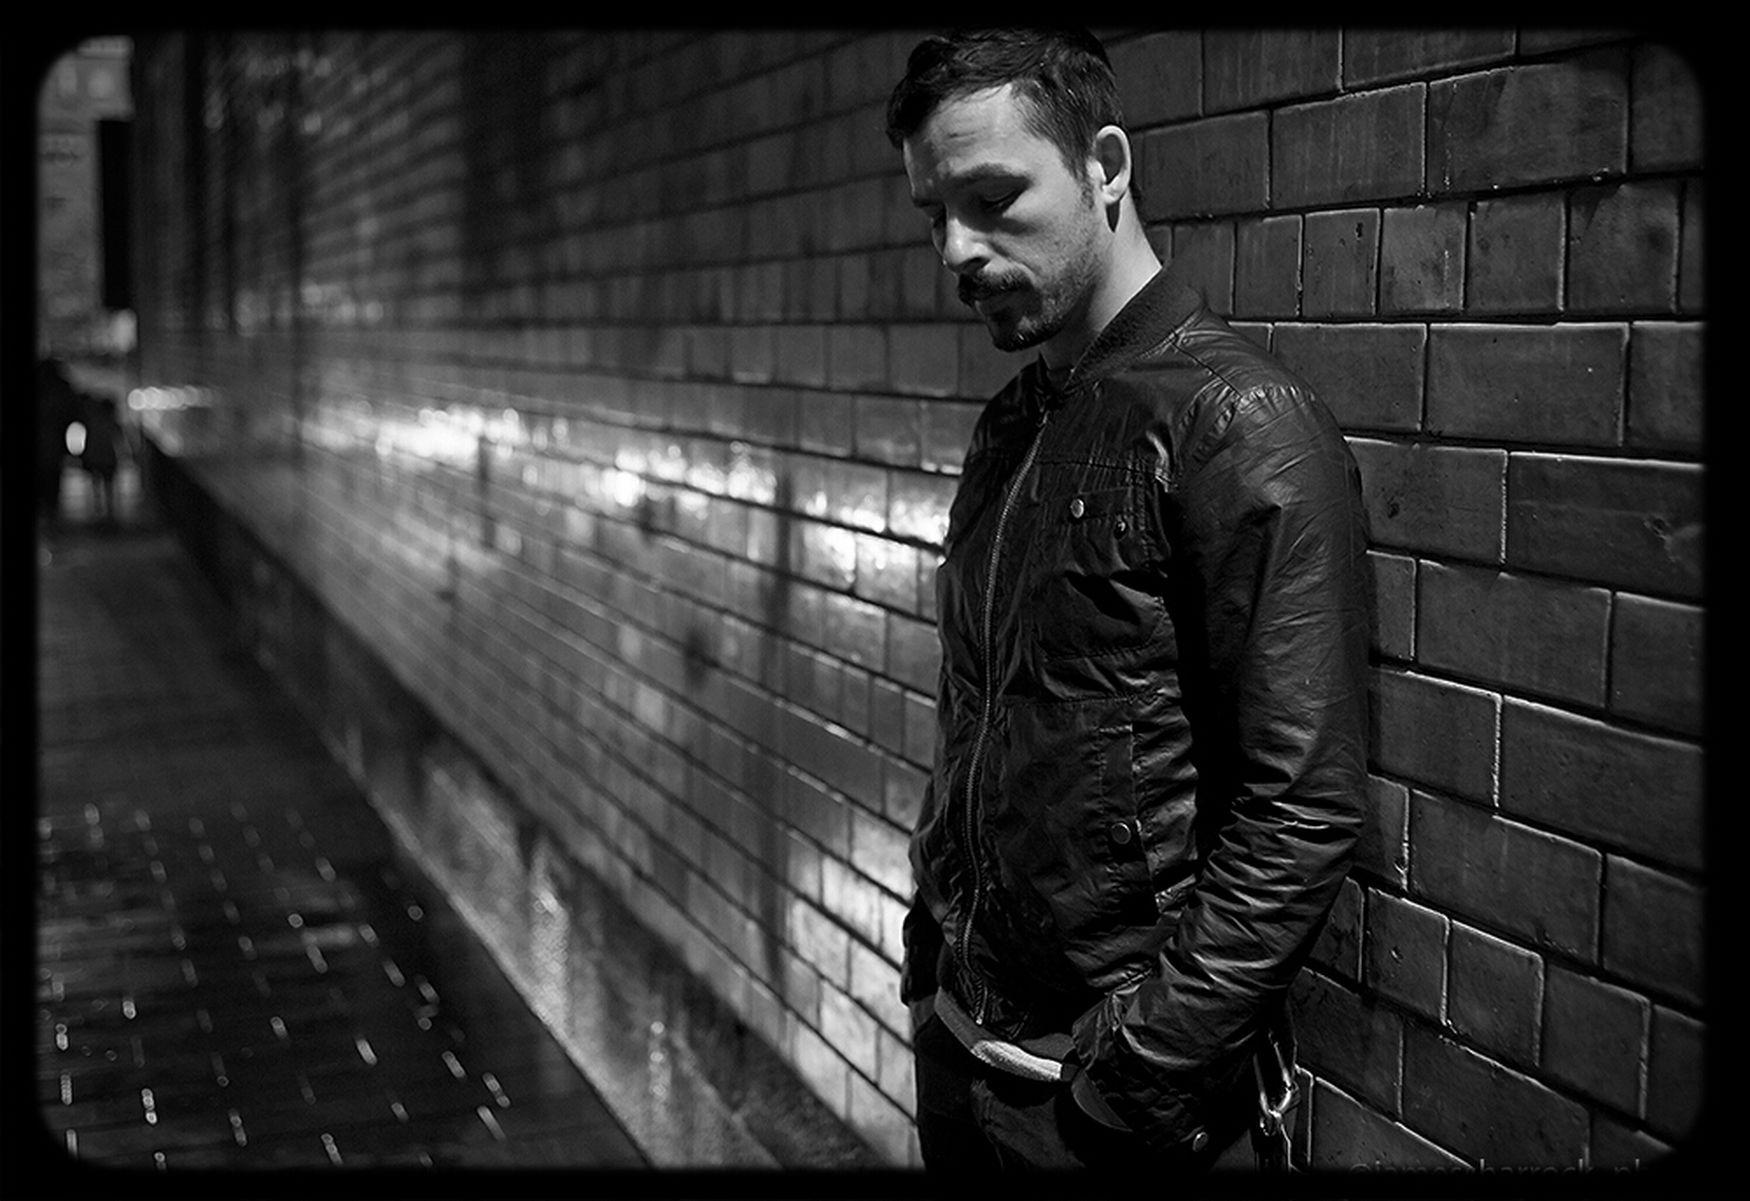 @benweinman Leeds, UK November 2013 @dillingerescapeplan Benweinman Dillingerescapeplan Jamessharrock_photo Partysmasherinc First Eyeem Photo